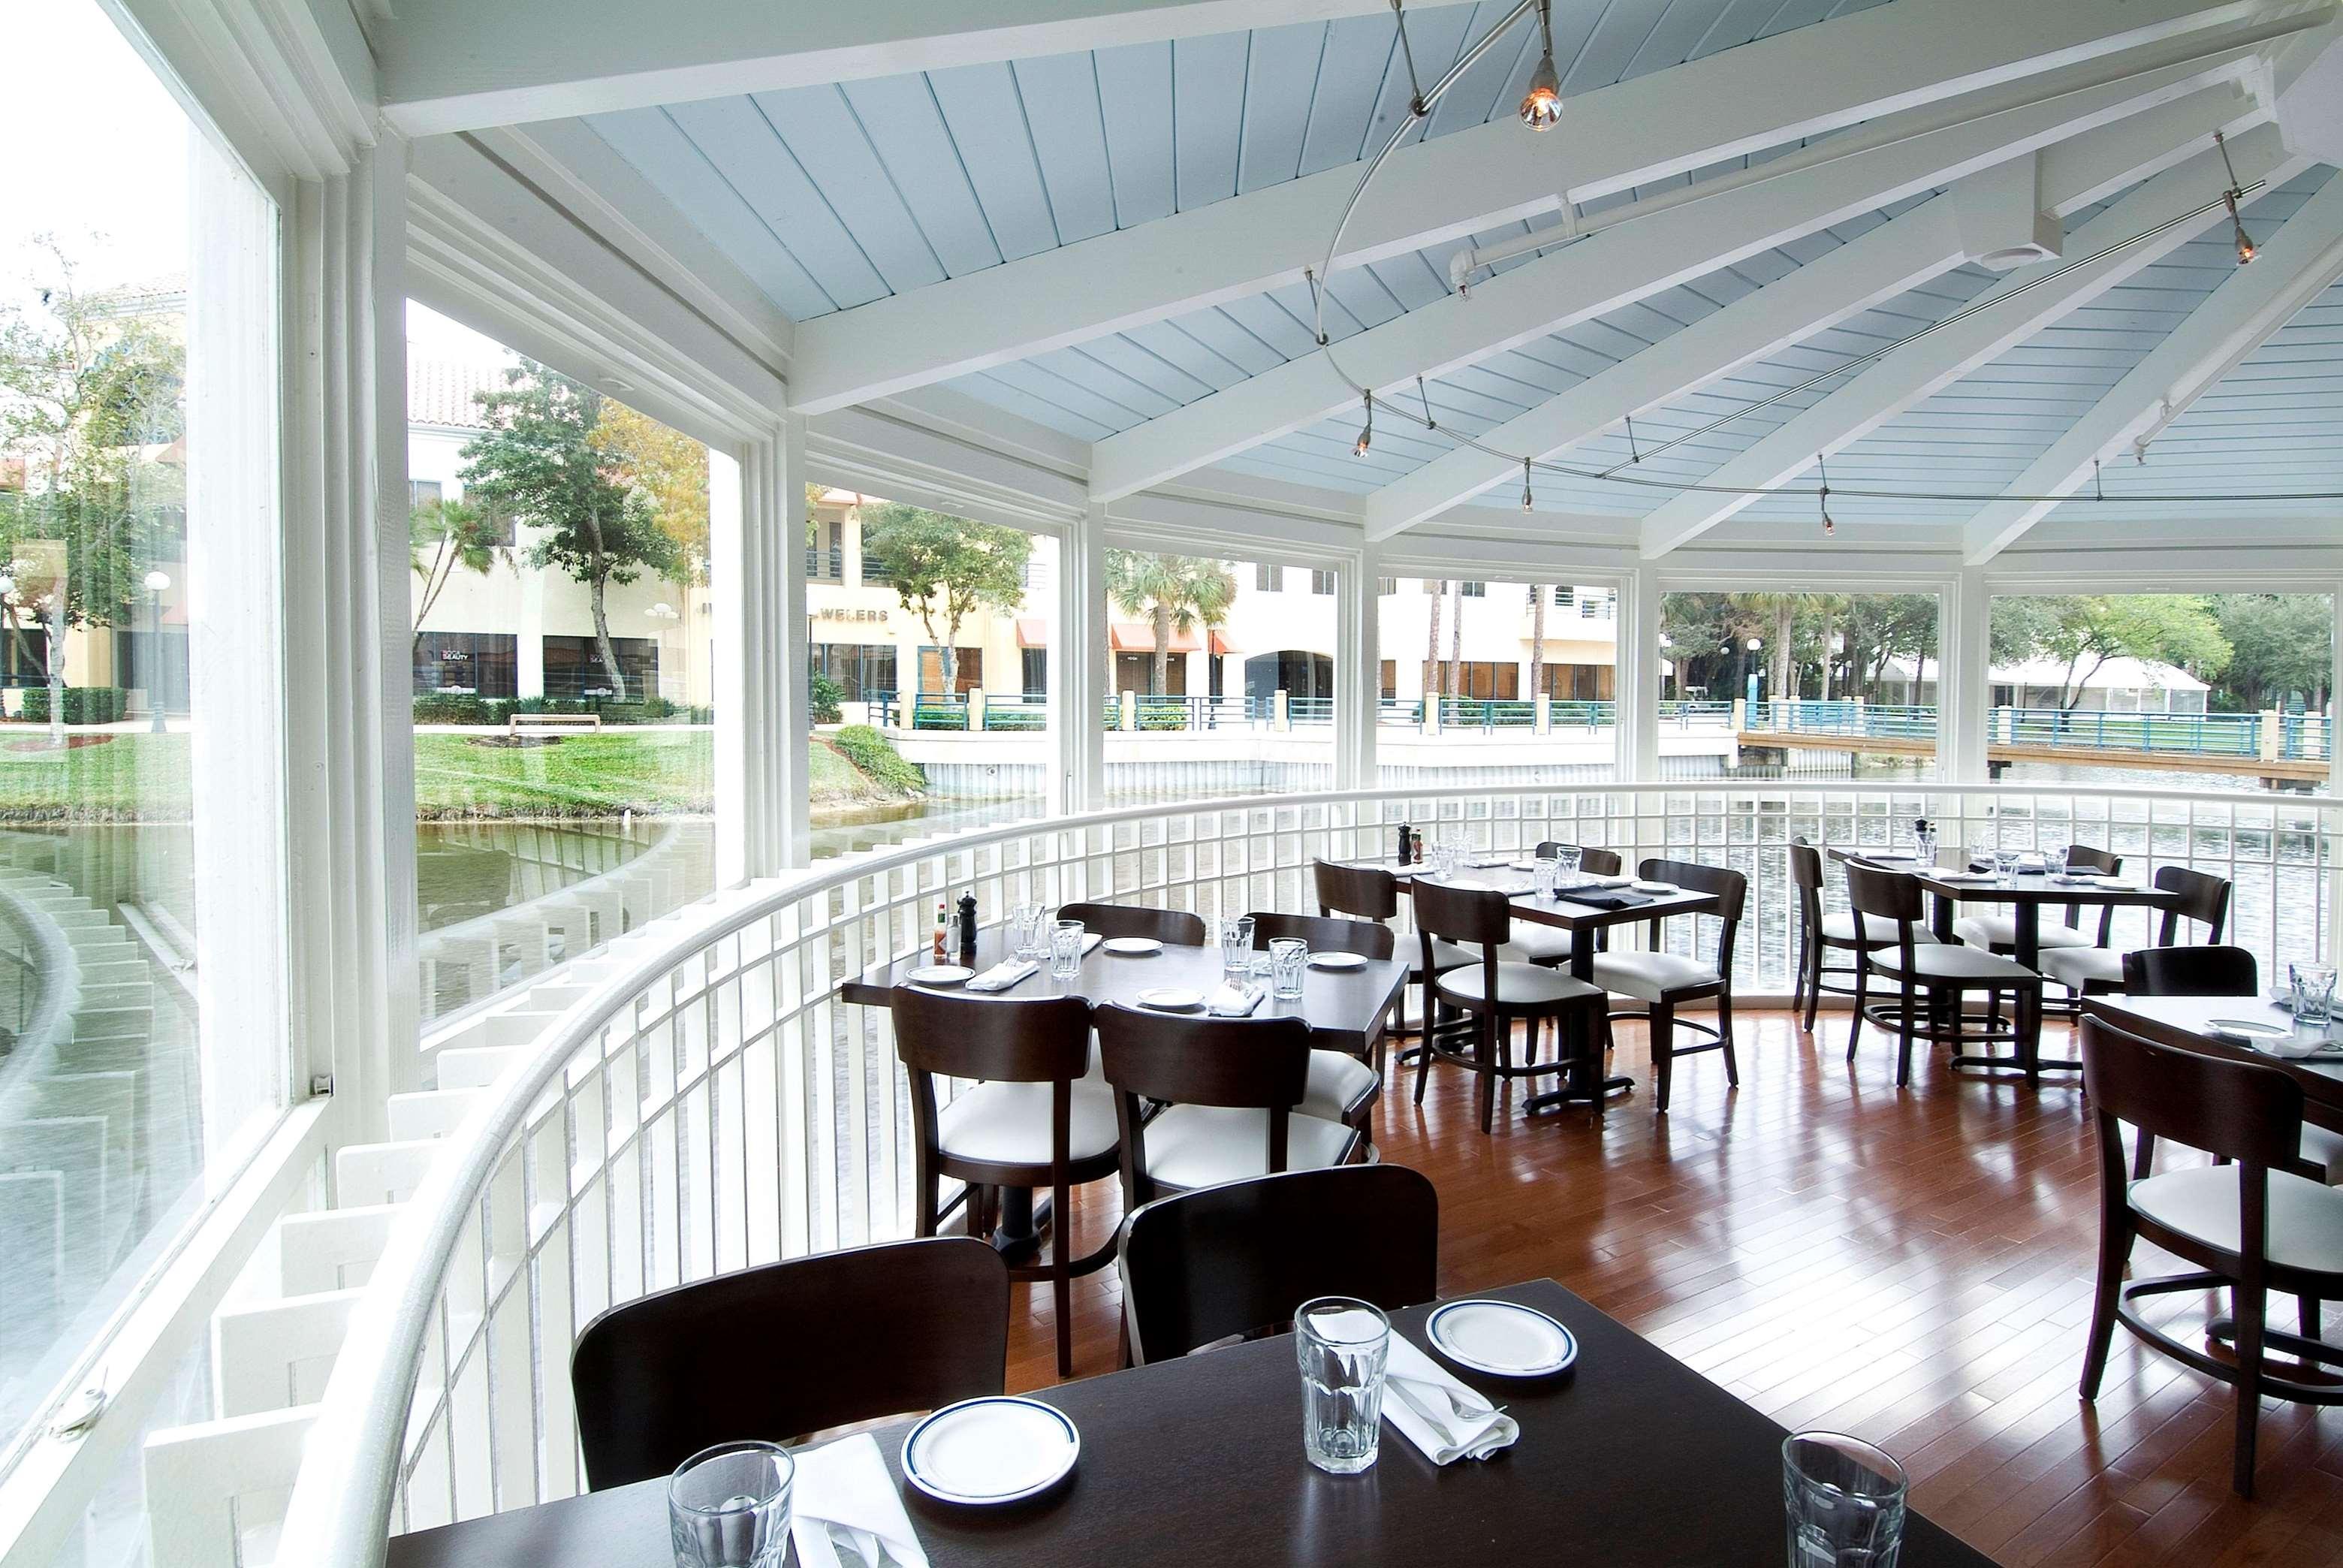 Hilton boca raton suites boca raton florida fl for Fish restaurants in boca raton